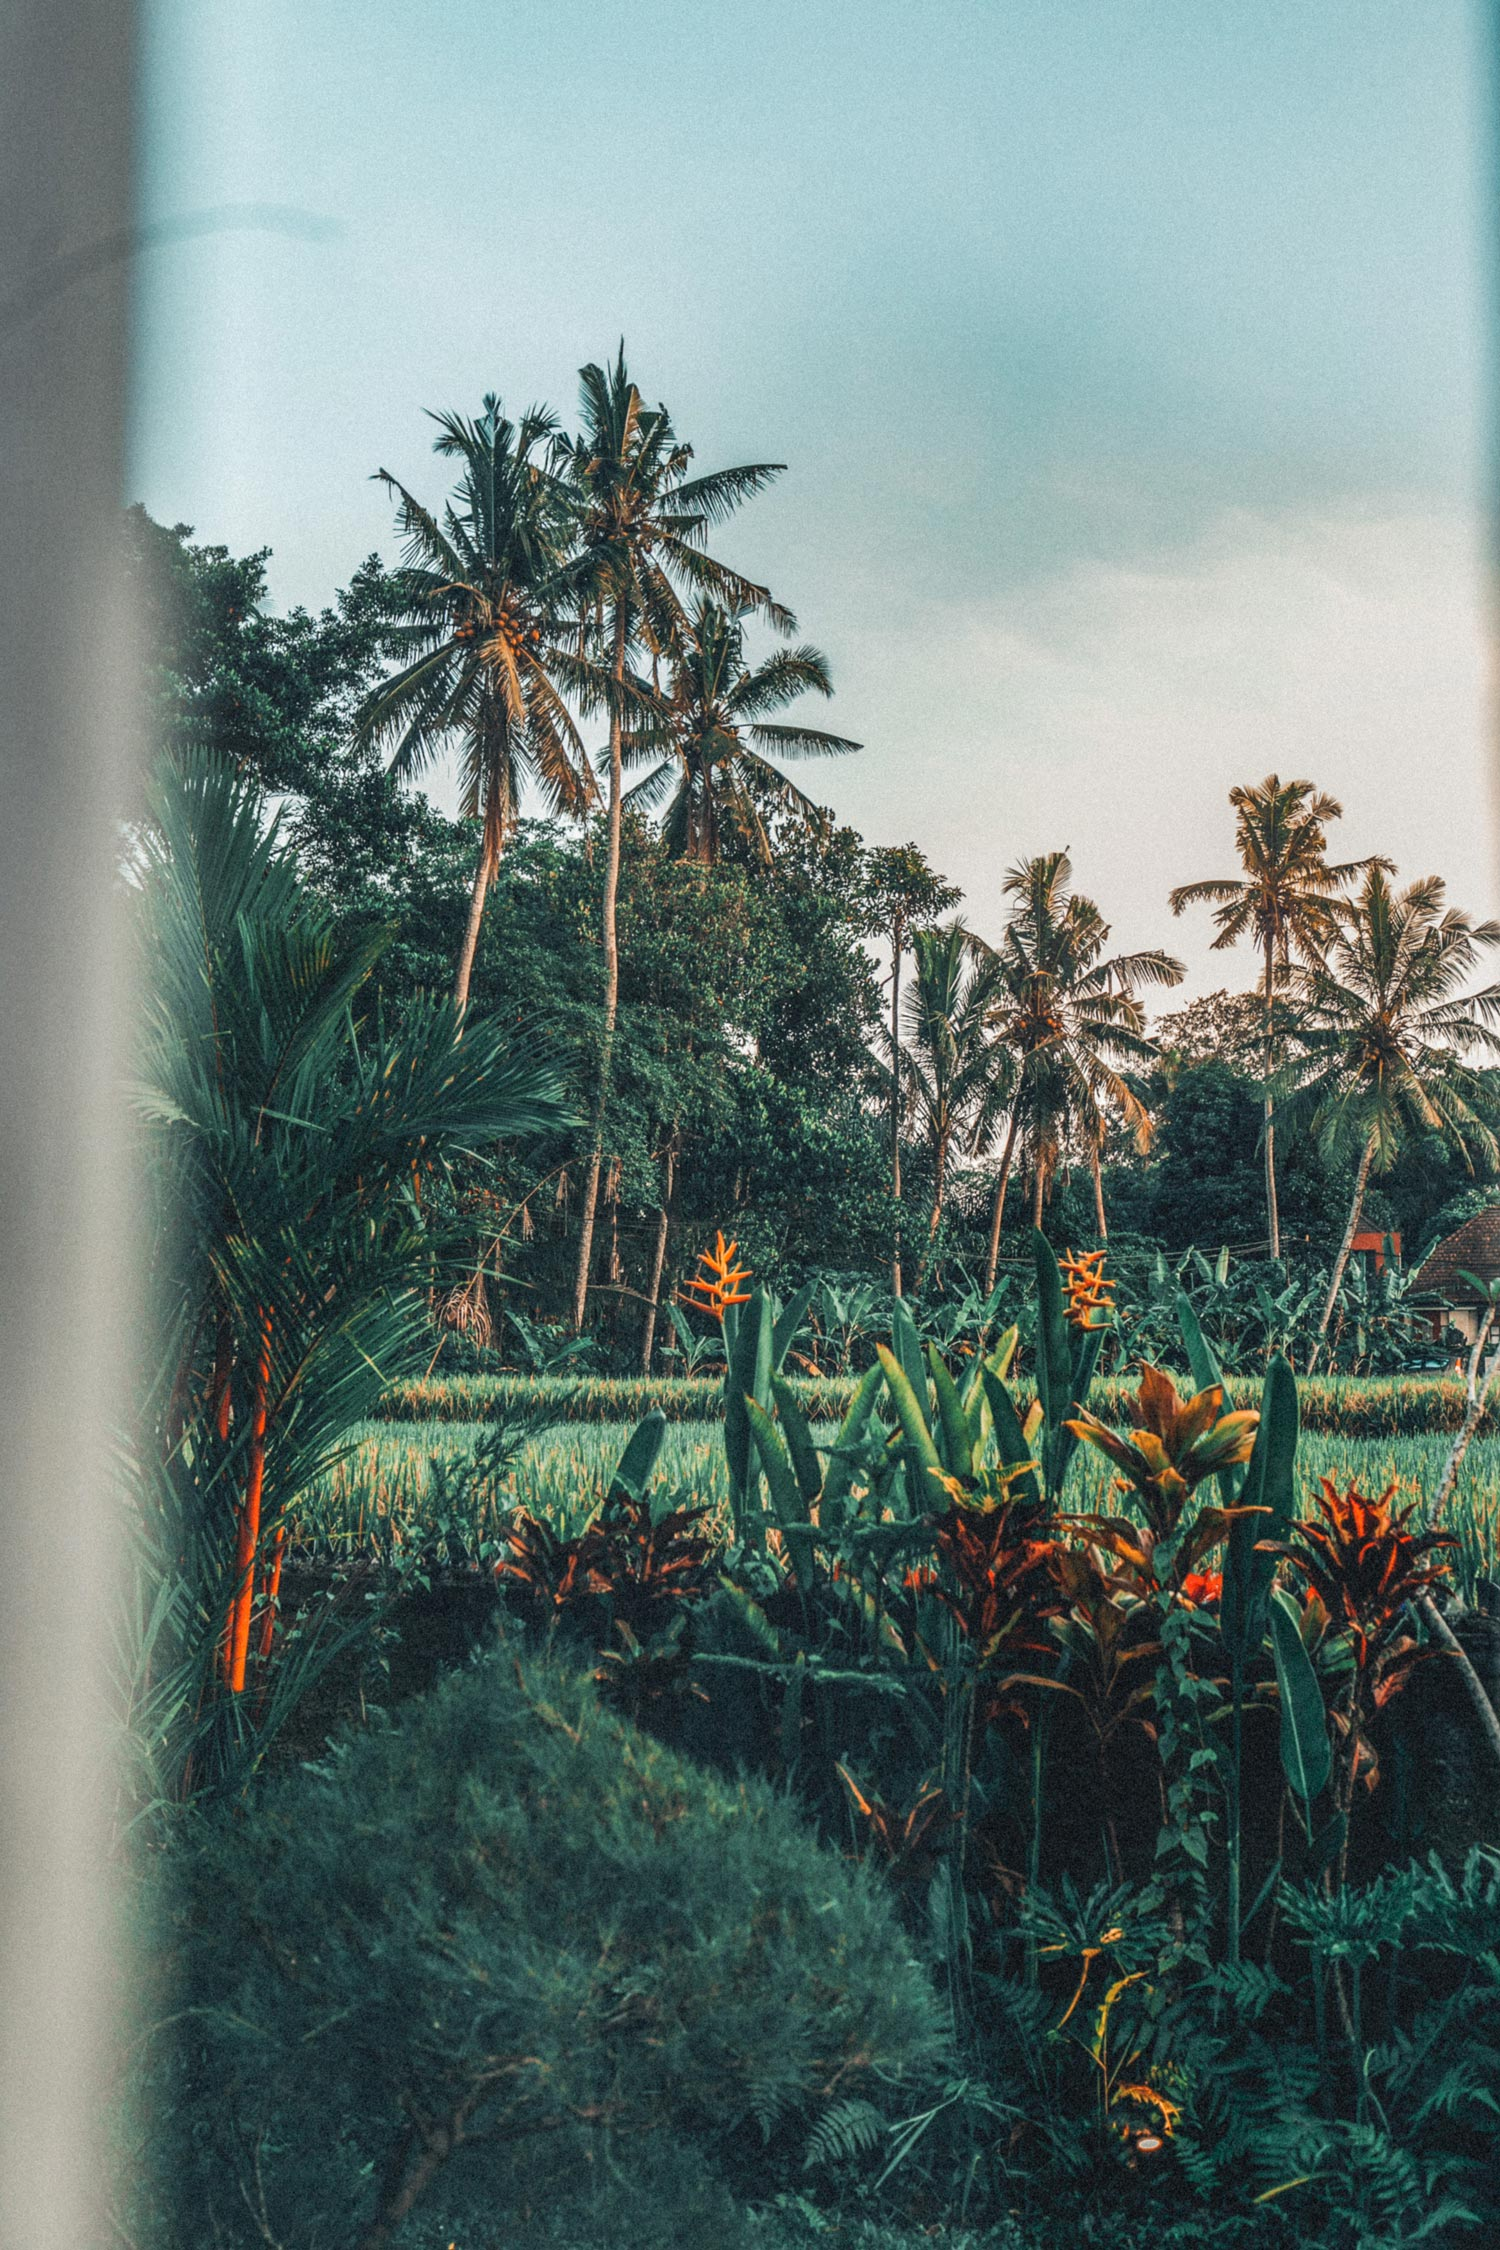 bali-indonesia-yoga-retreat-travel-photography-4.jpg